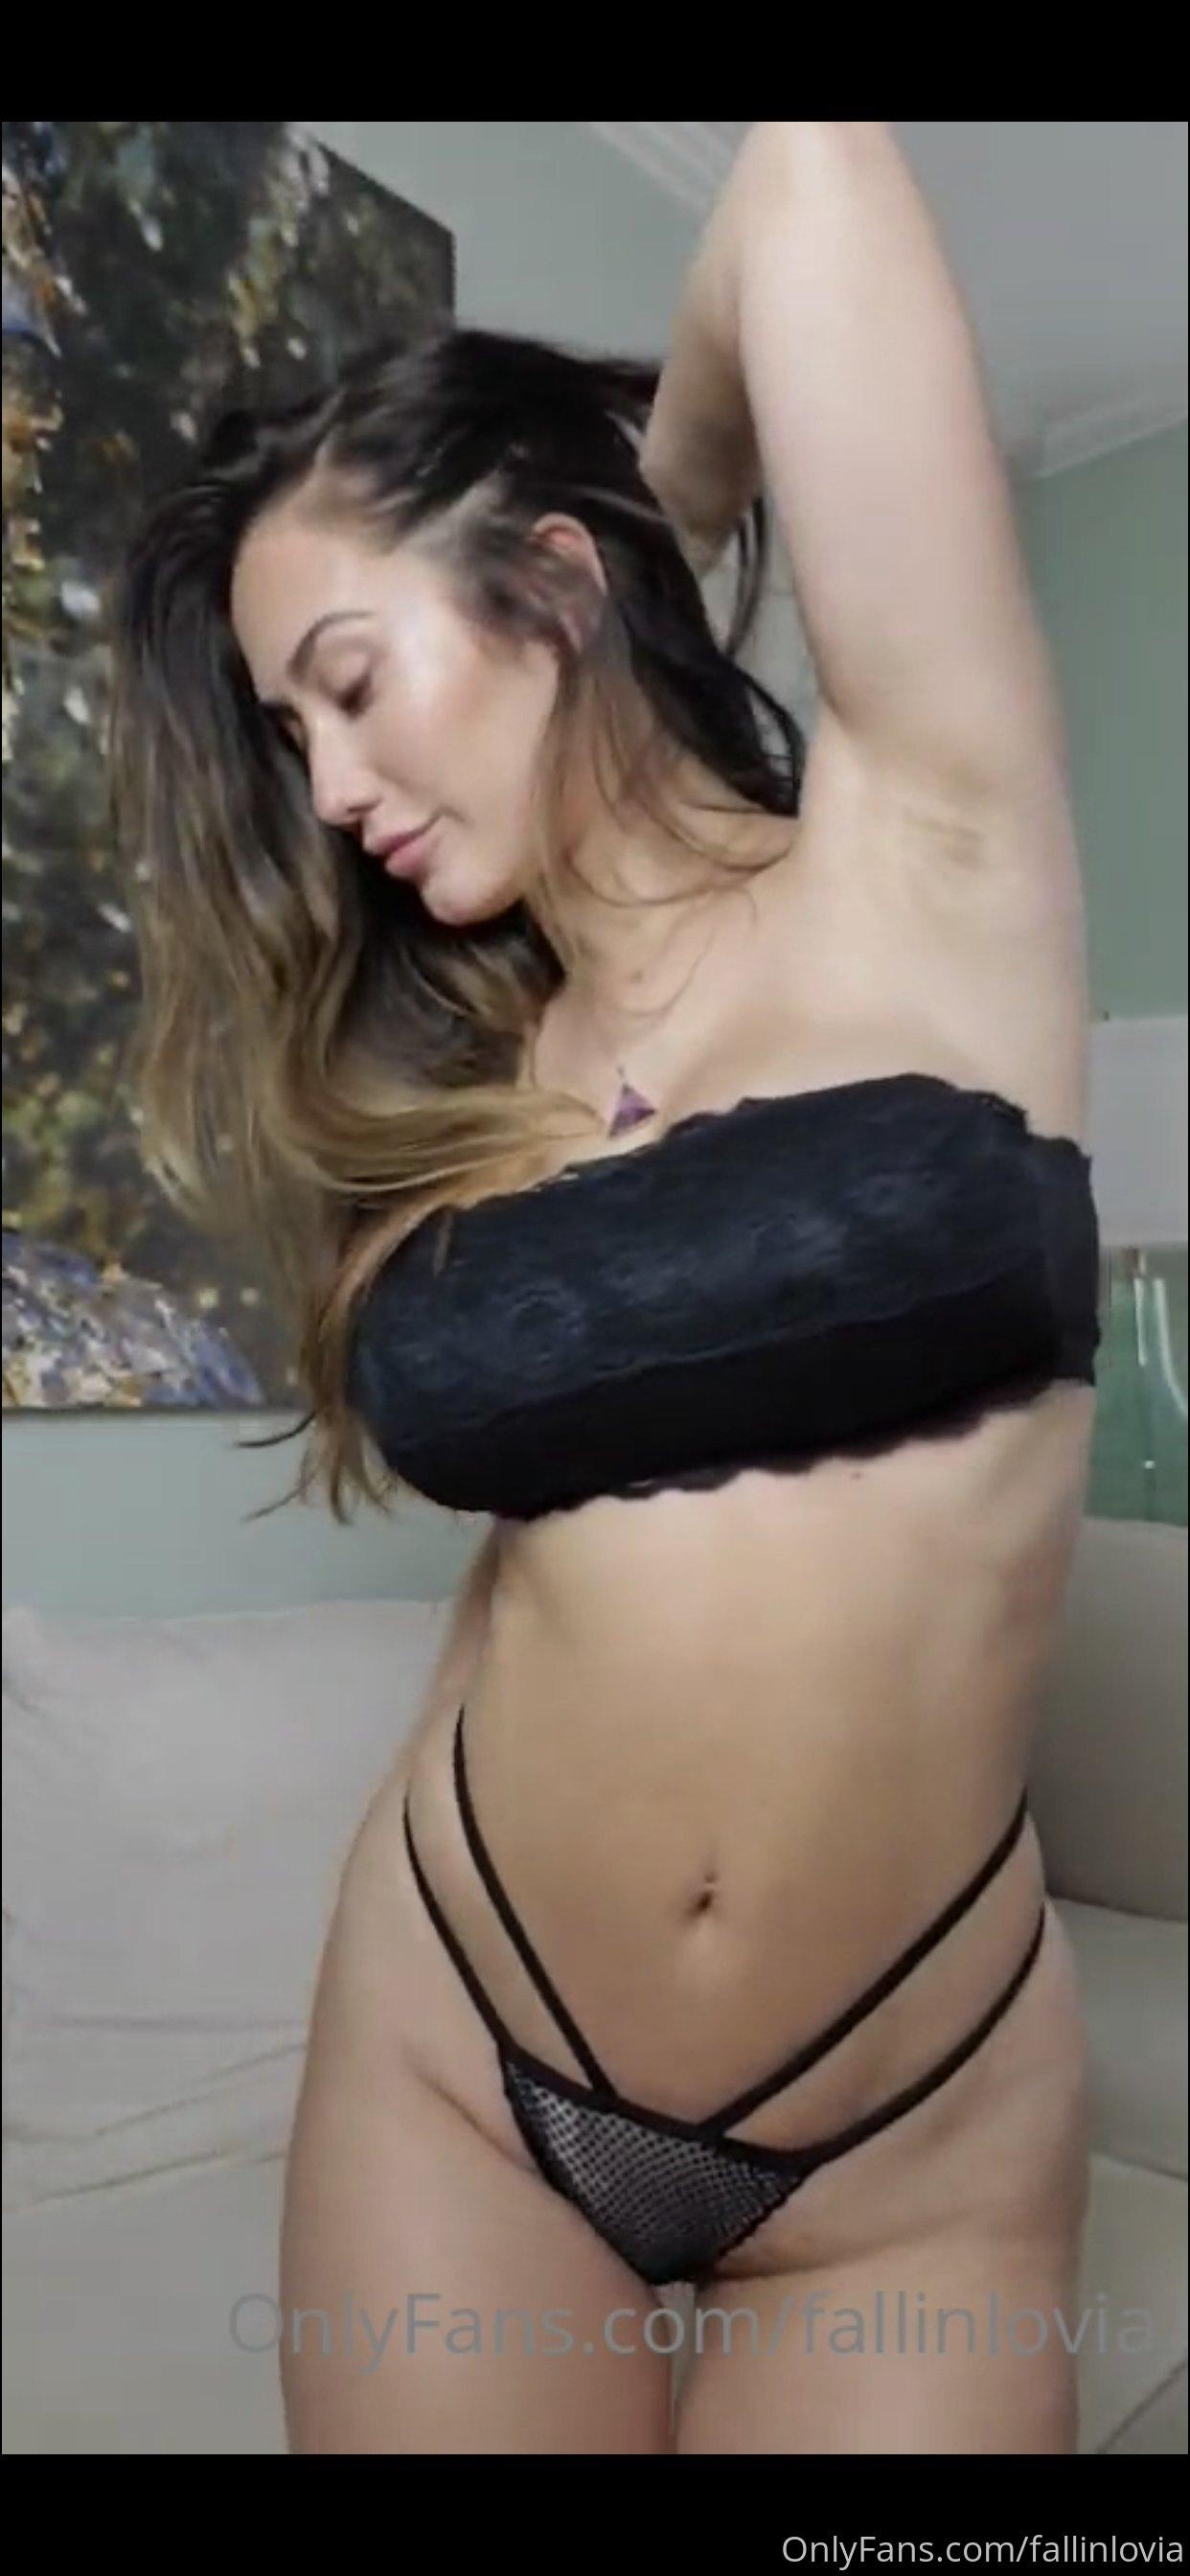 Eva Lovia, Fallinlovia, Onlyfans 0163